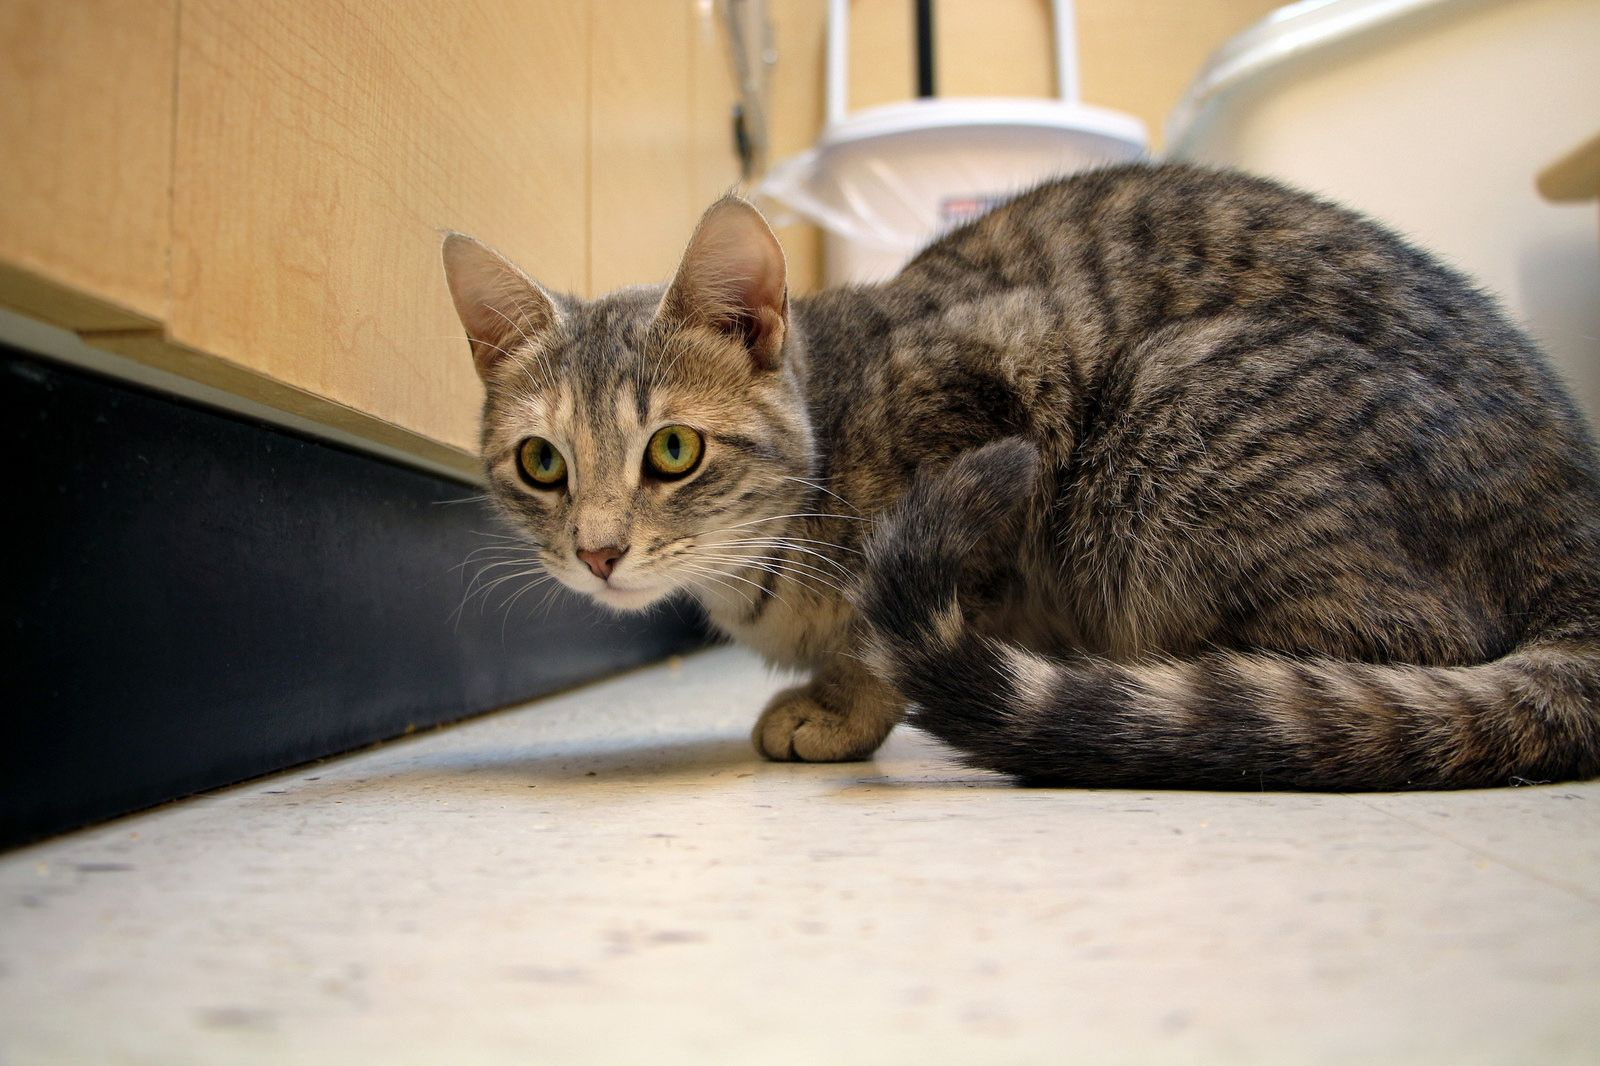 Felicity Scat Petsmart Adoption Centre Cat Photo Cat Adoption Adoption Center